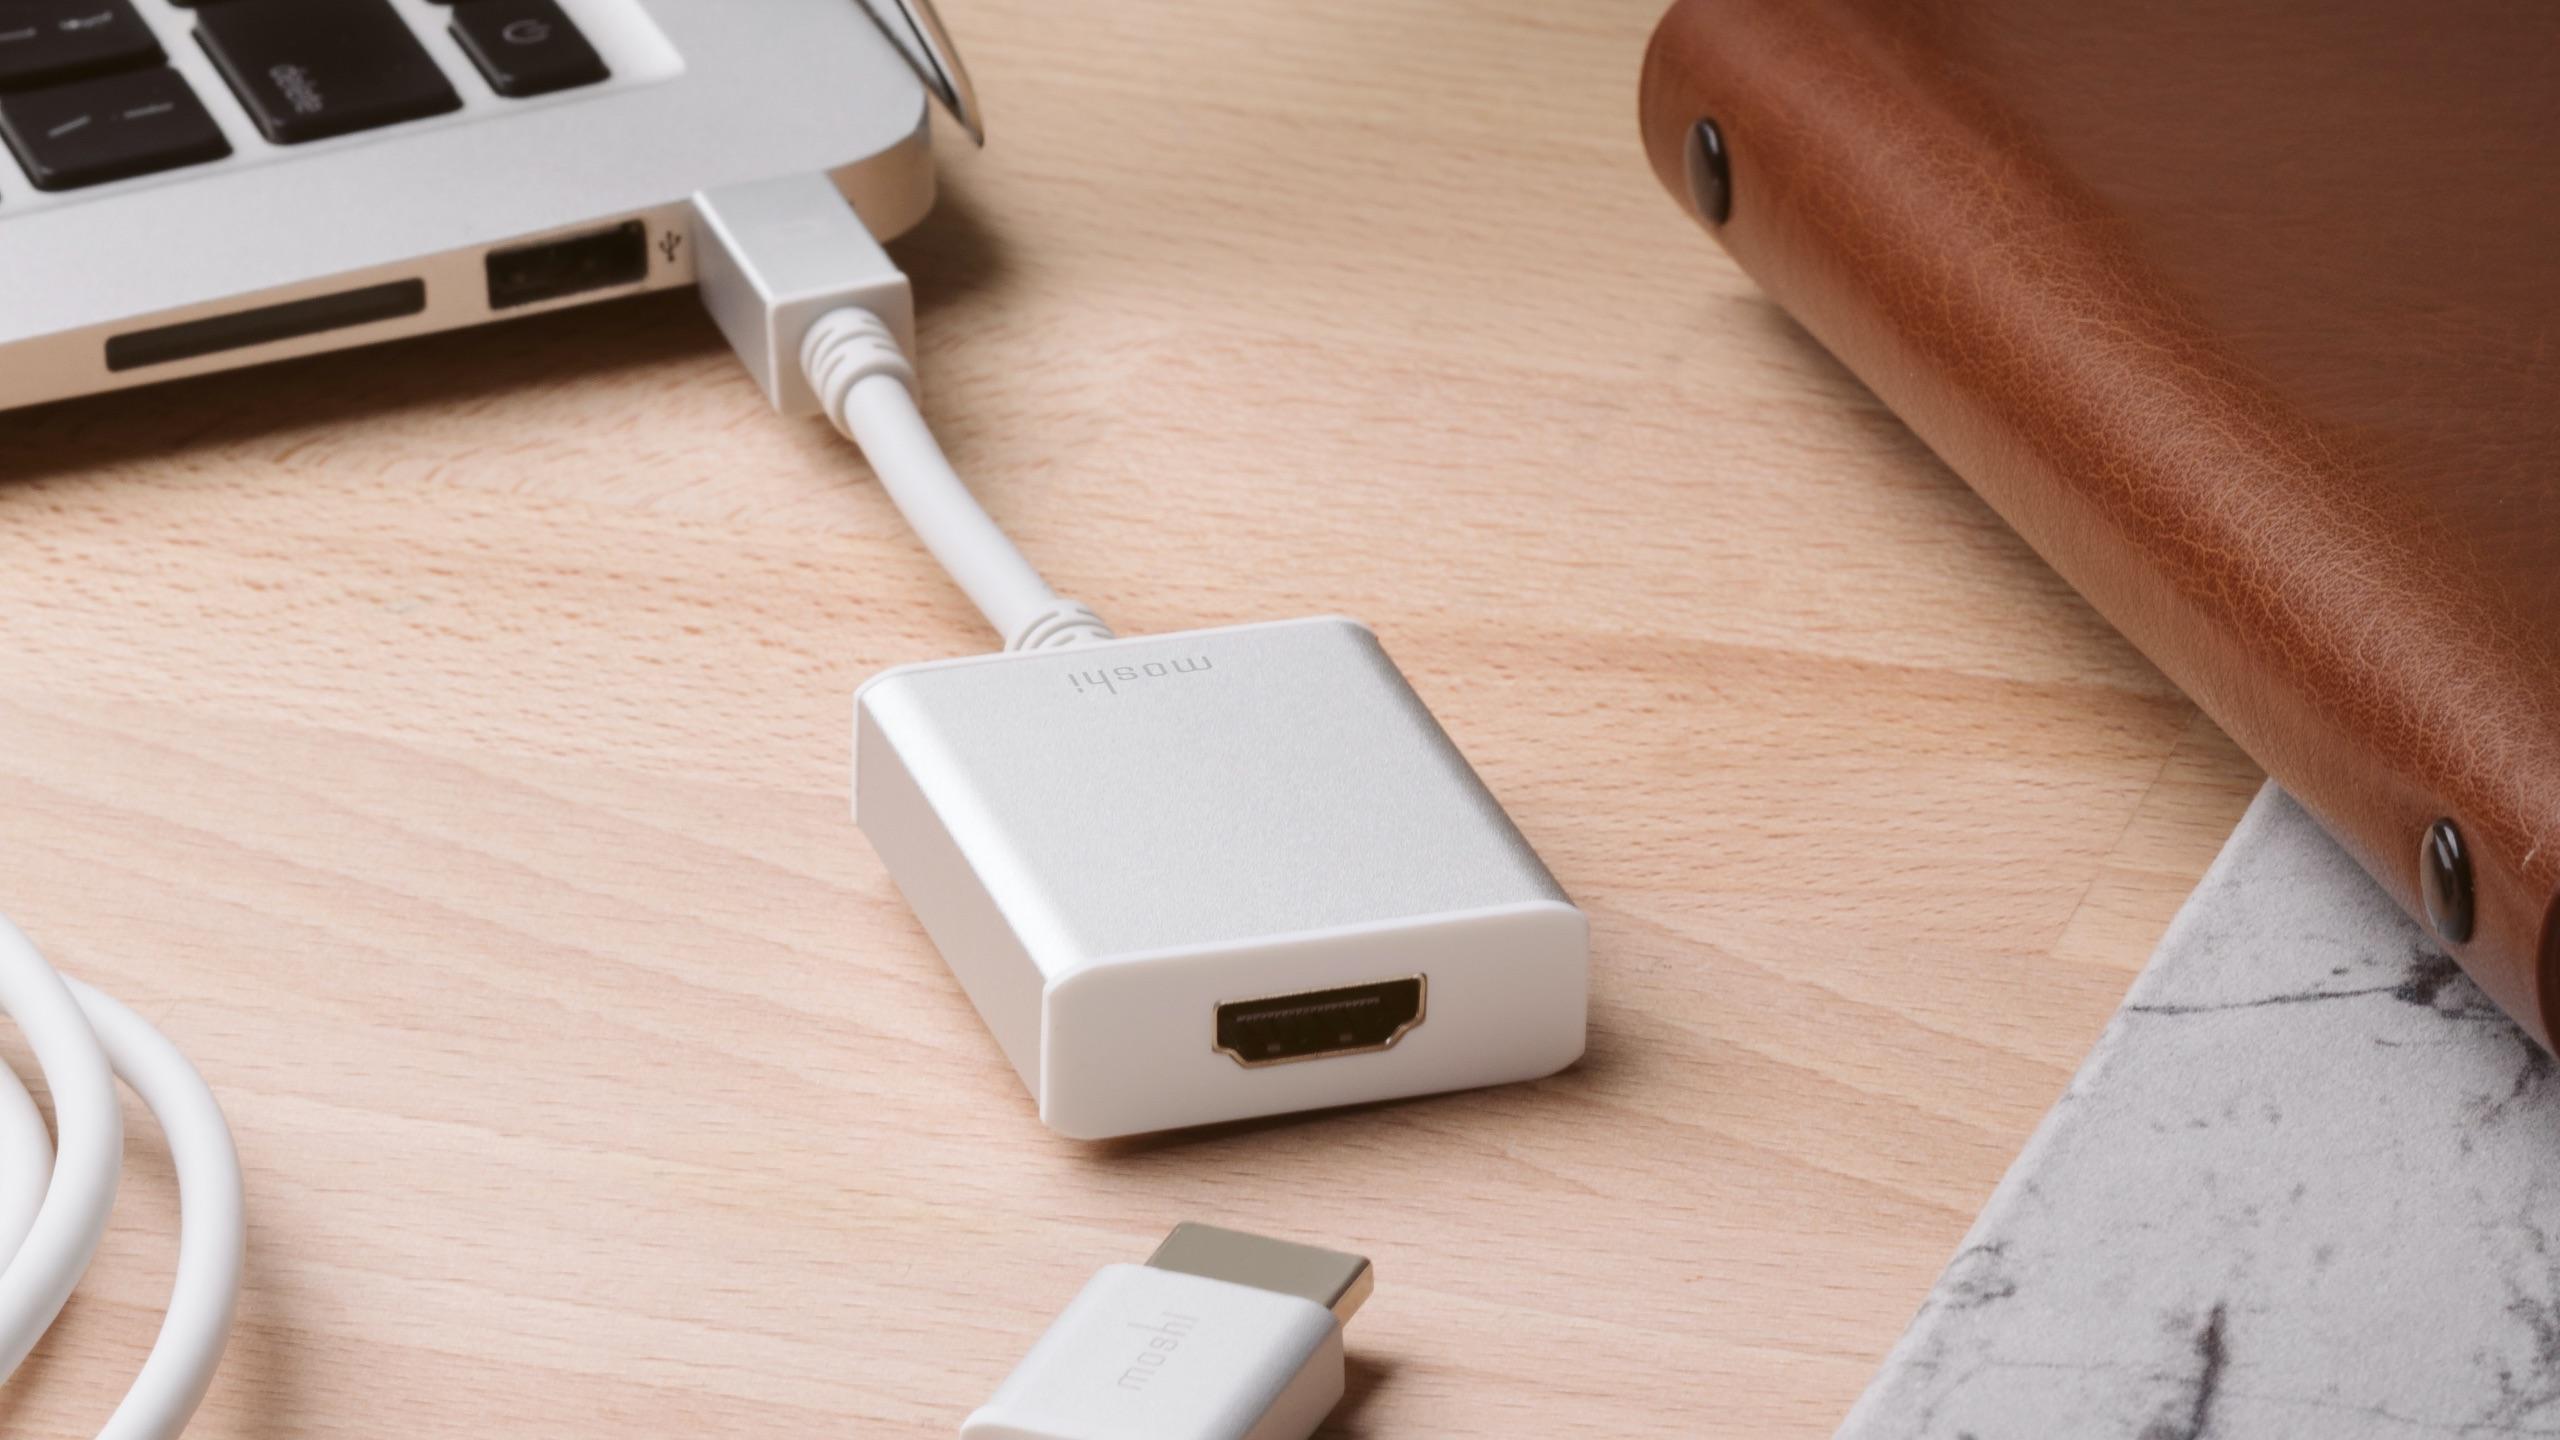 Mini DisplayPort to HDMI Adapter (4K)-image